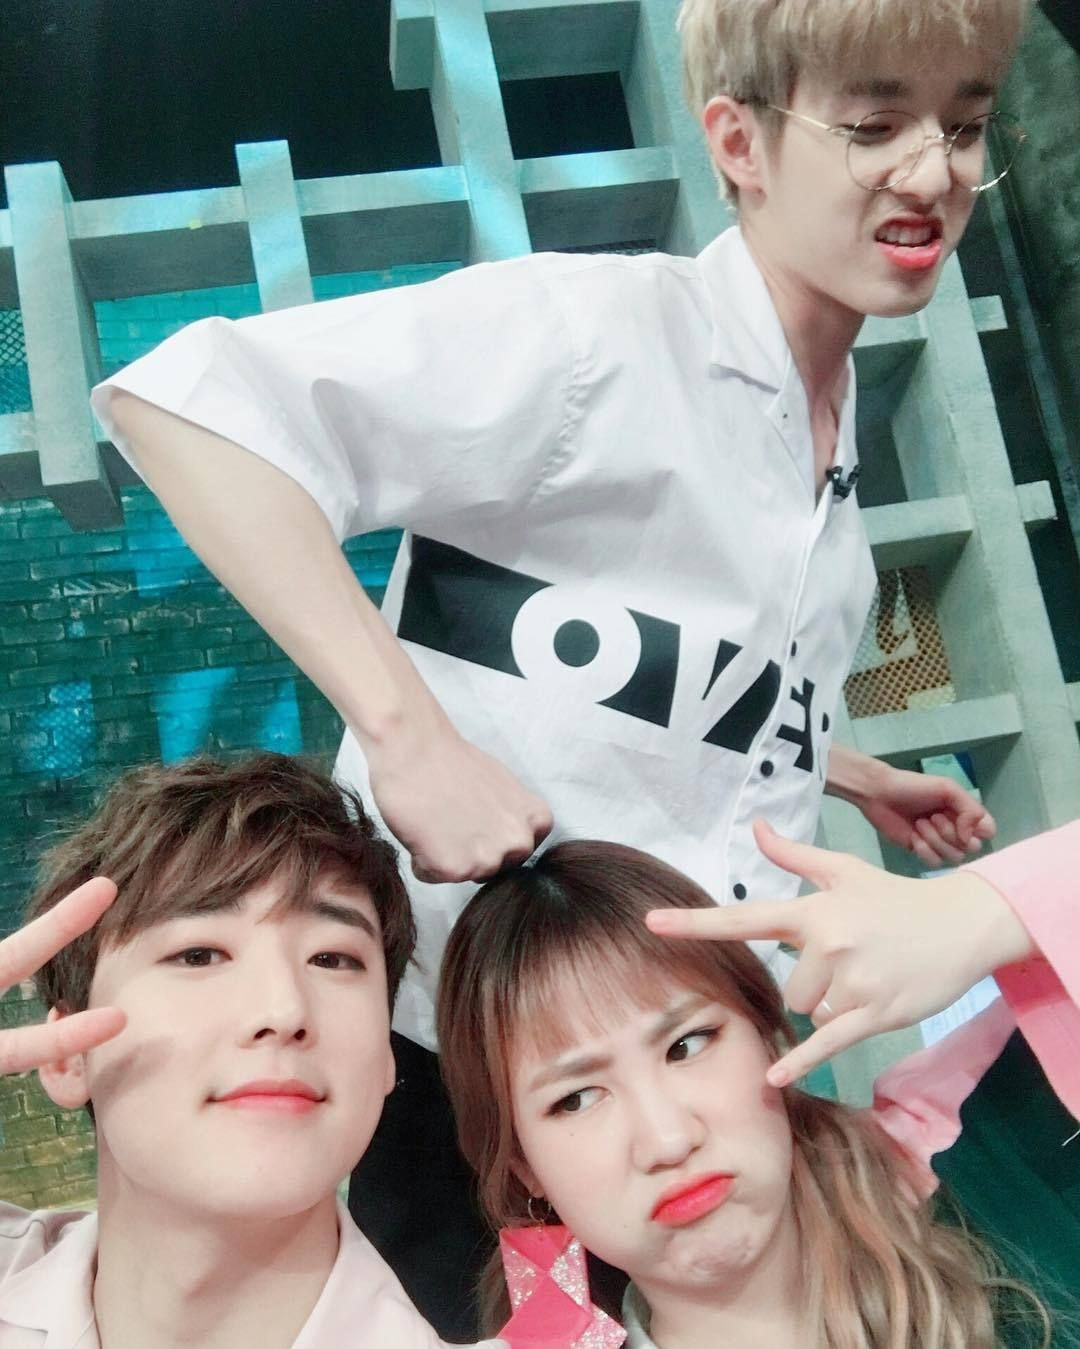 "jamieprotectionsquad: ""arirang_asc: 놓칠 수 없는 우리 삼둥이들 셀카 📷 이러케 귀엽게 사진 찍기 있기없기 😭 - #KAEMIN selfie is a must! Even though Jae was a guest today😂 - #KEVIN #JIMIN #JAE #arirang_ASC """